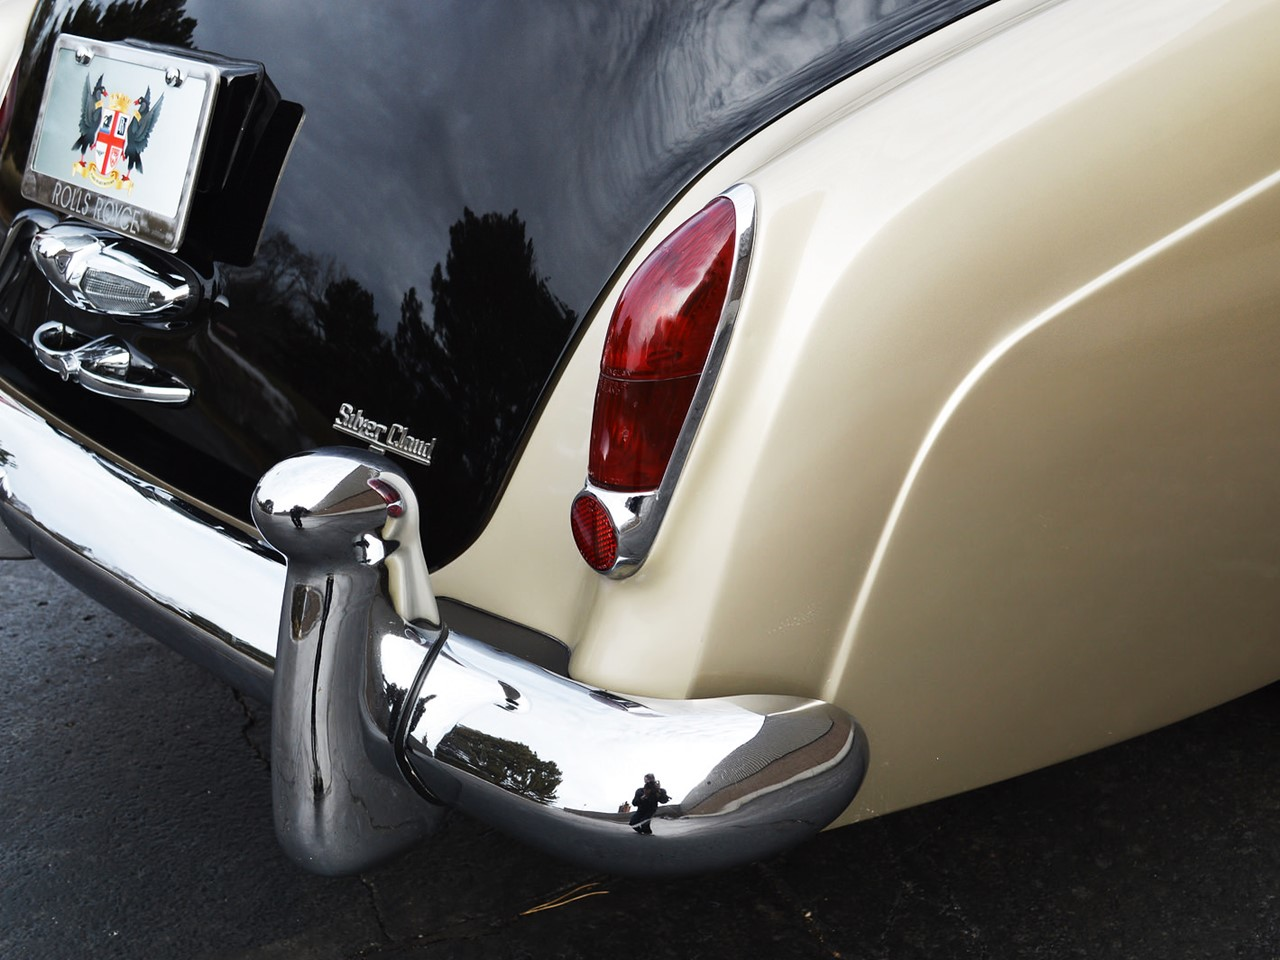 1963 Silver Cloud III 9